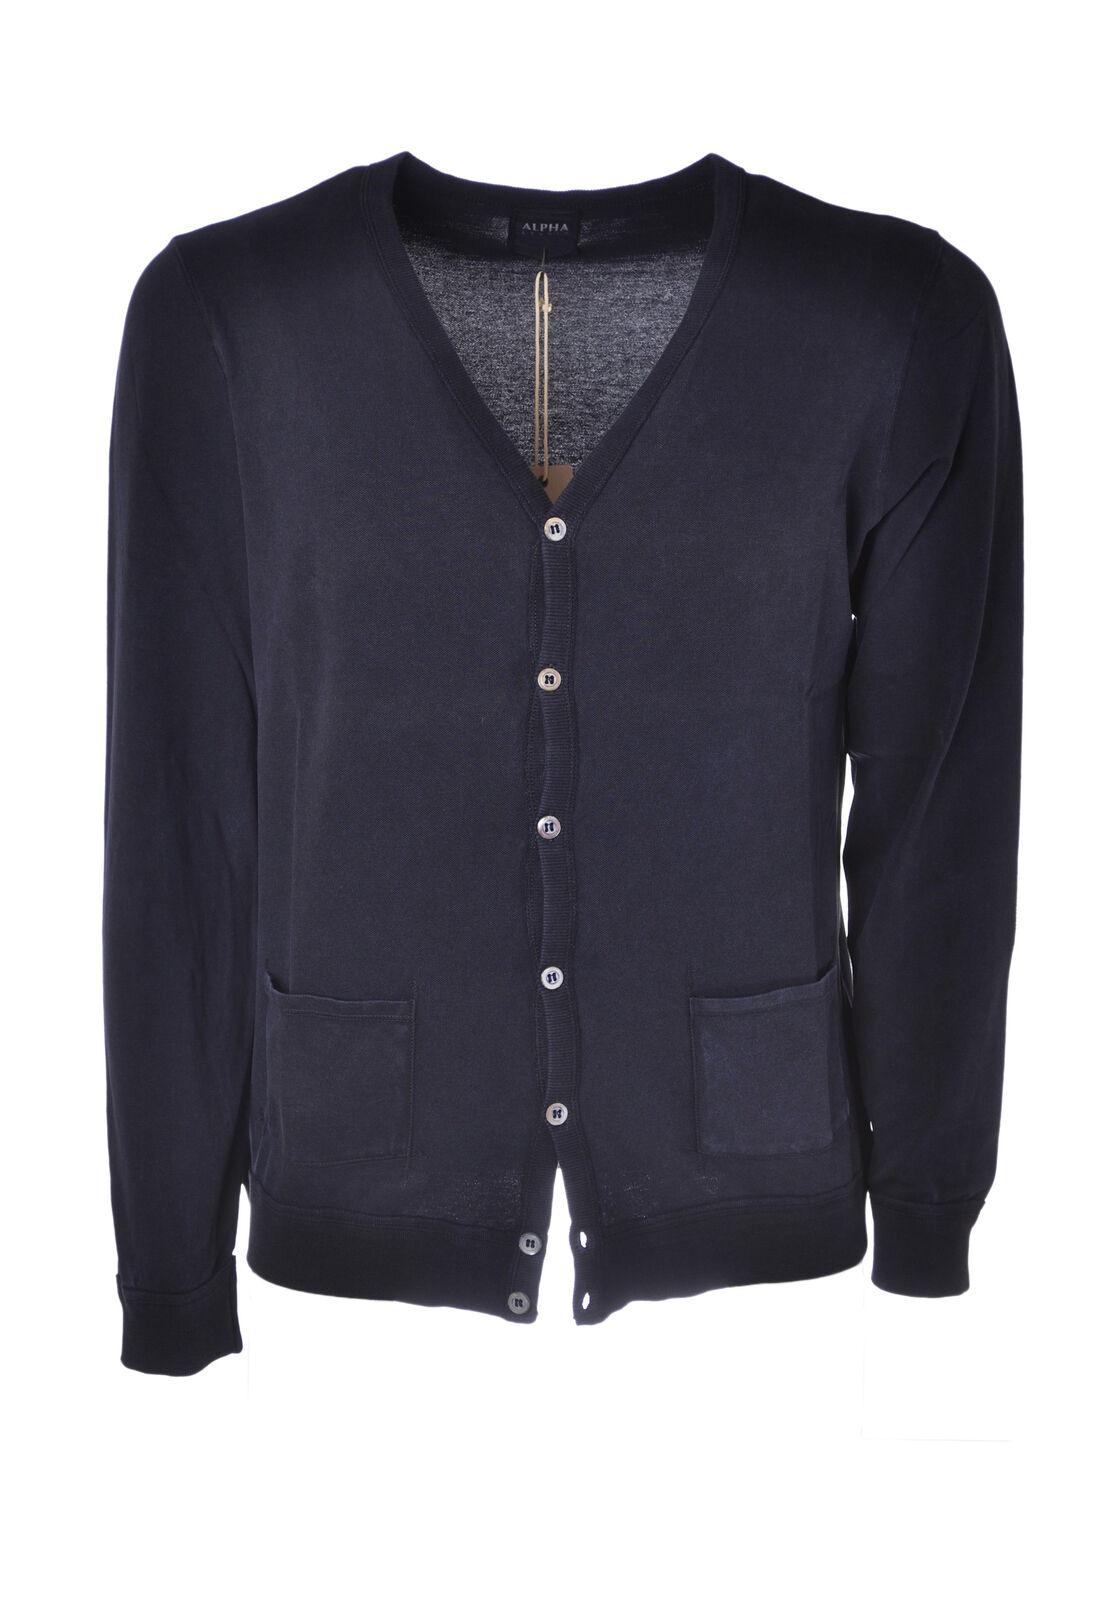 Alpha - Knitwear-Cardigan - Man - bluee - 4560308C191529